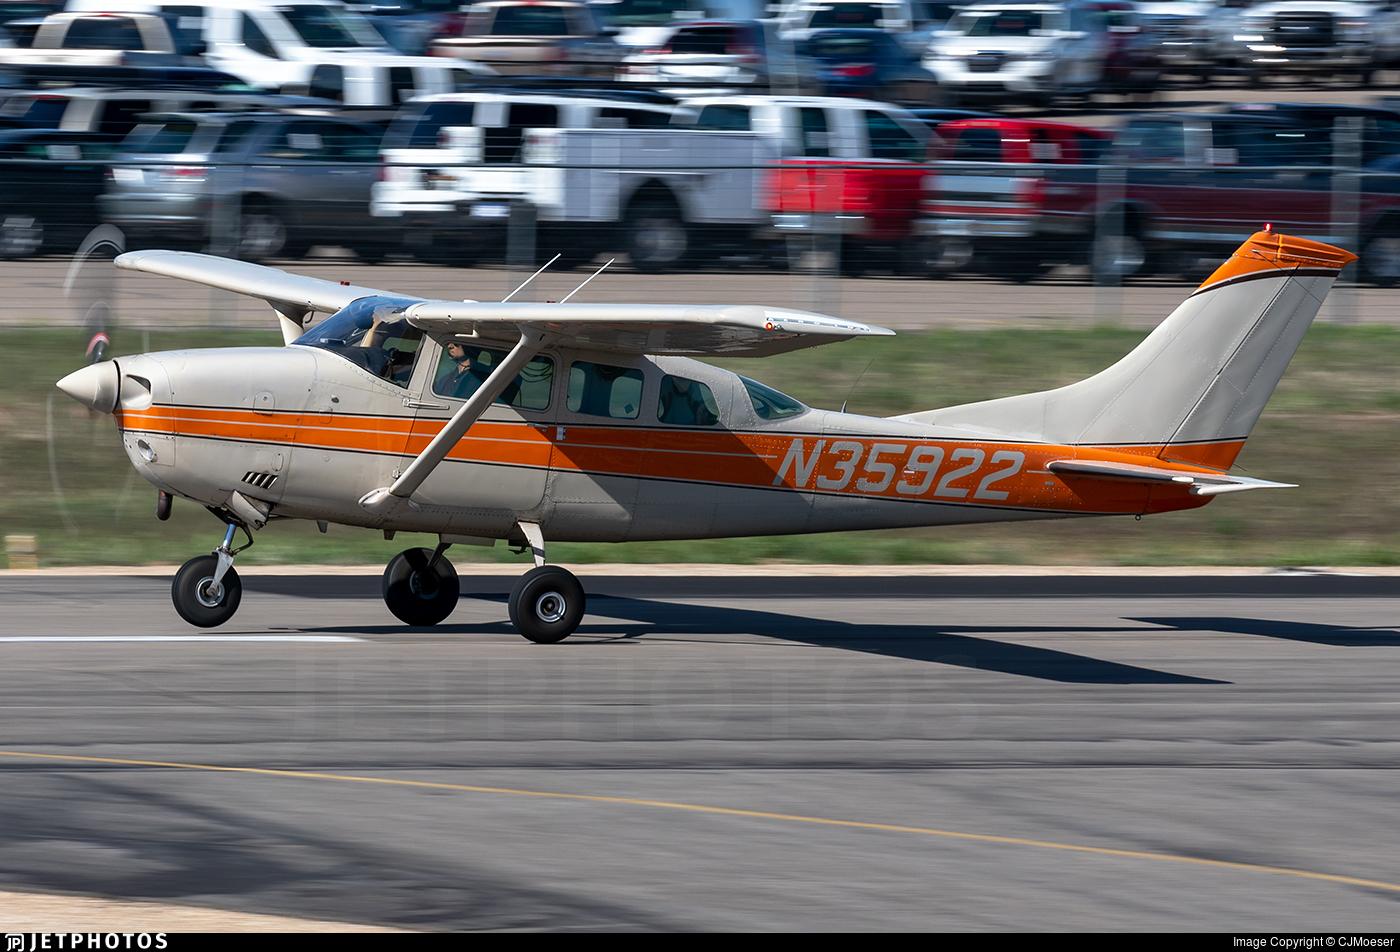 N35922 - Cessna TU206F Turbo Stationair - Private